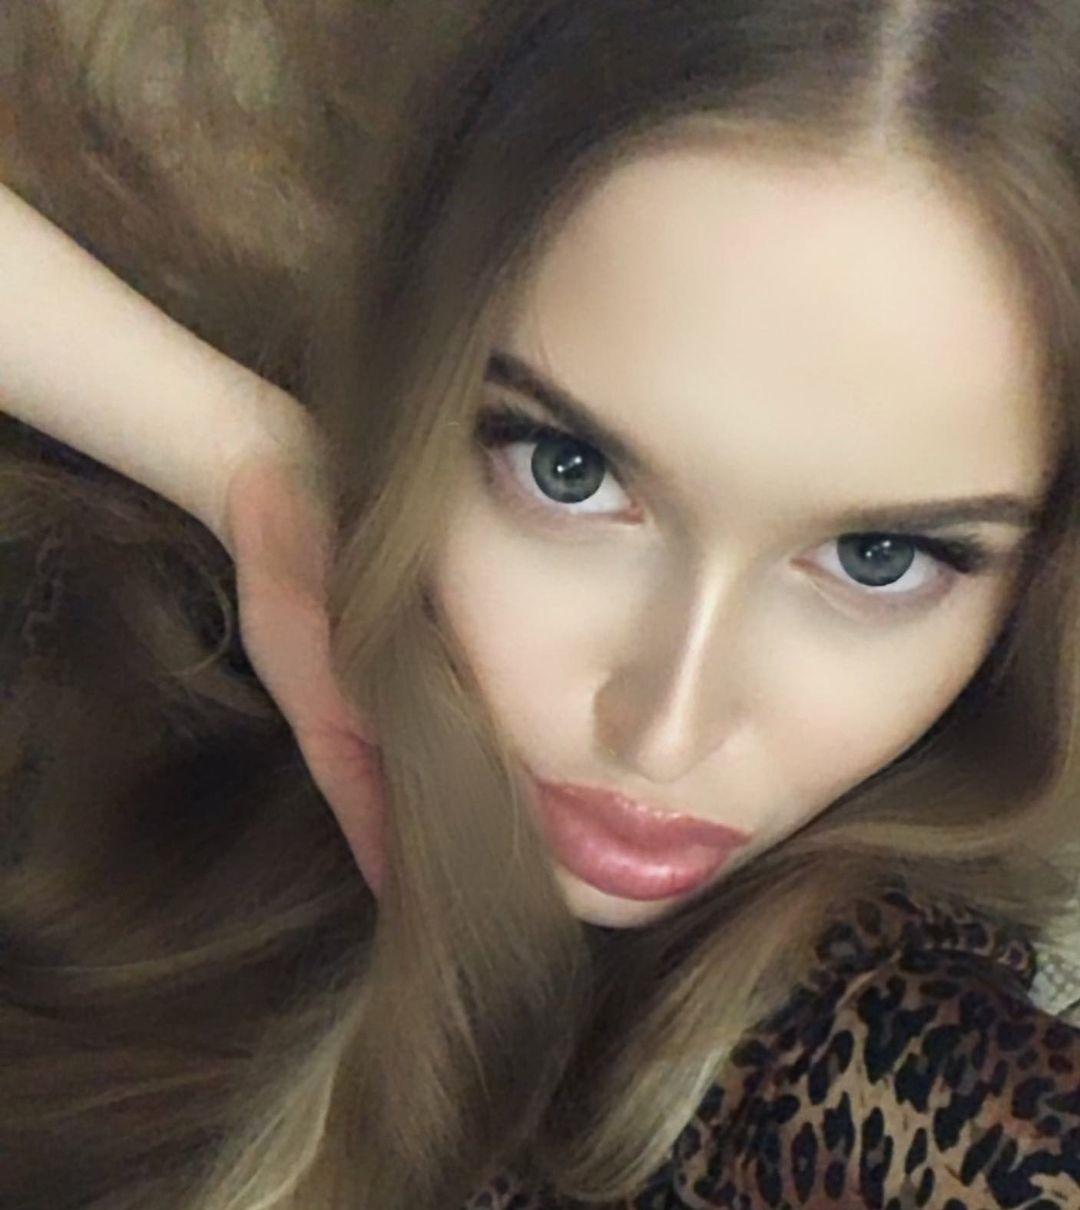 Angelina-Samokhina-Wallpapers-Insta-Fit-Bio-10